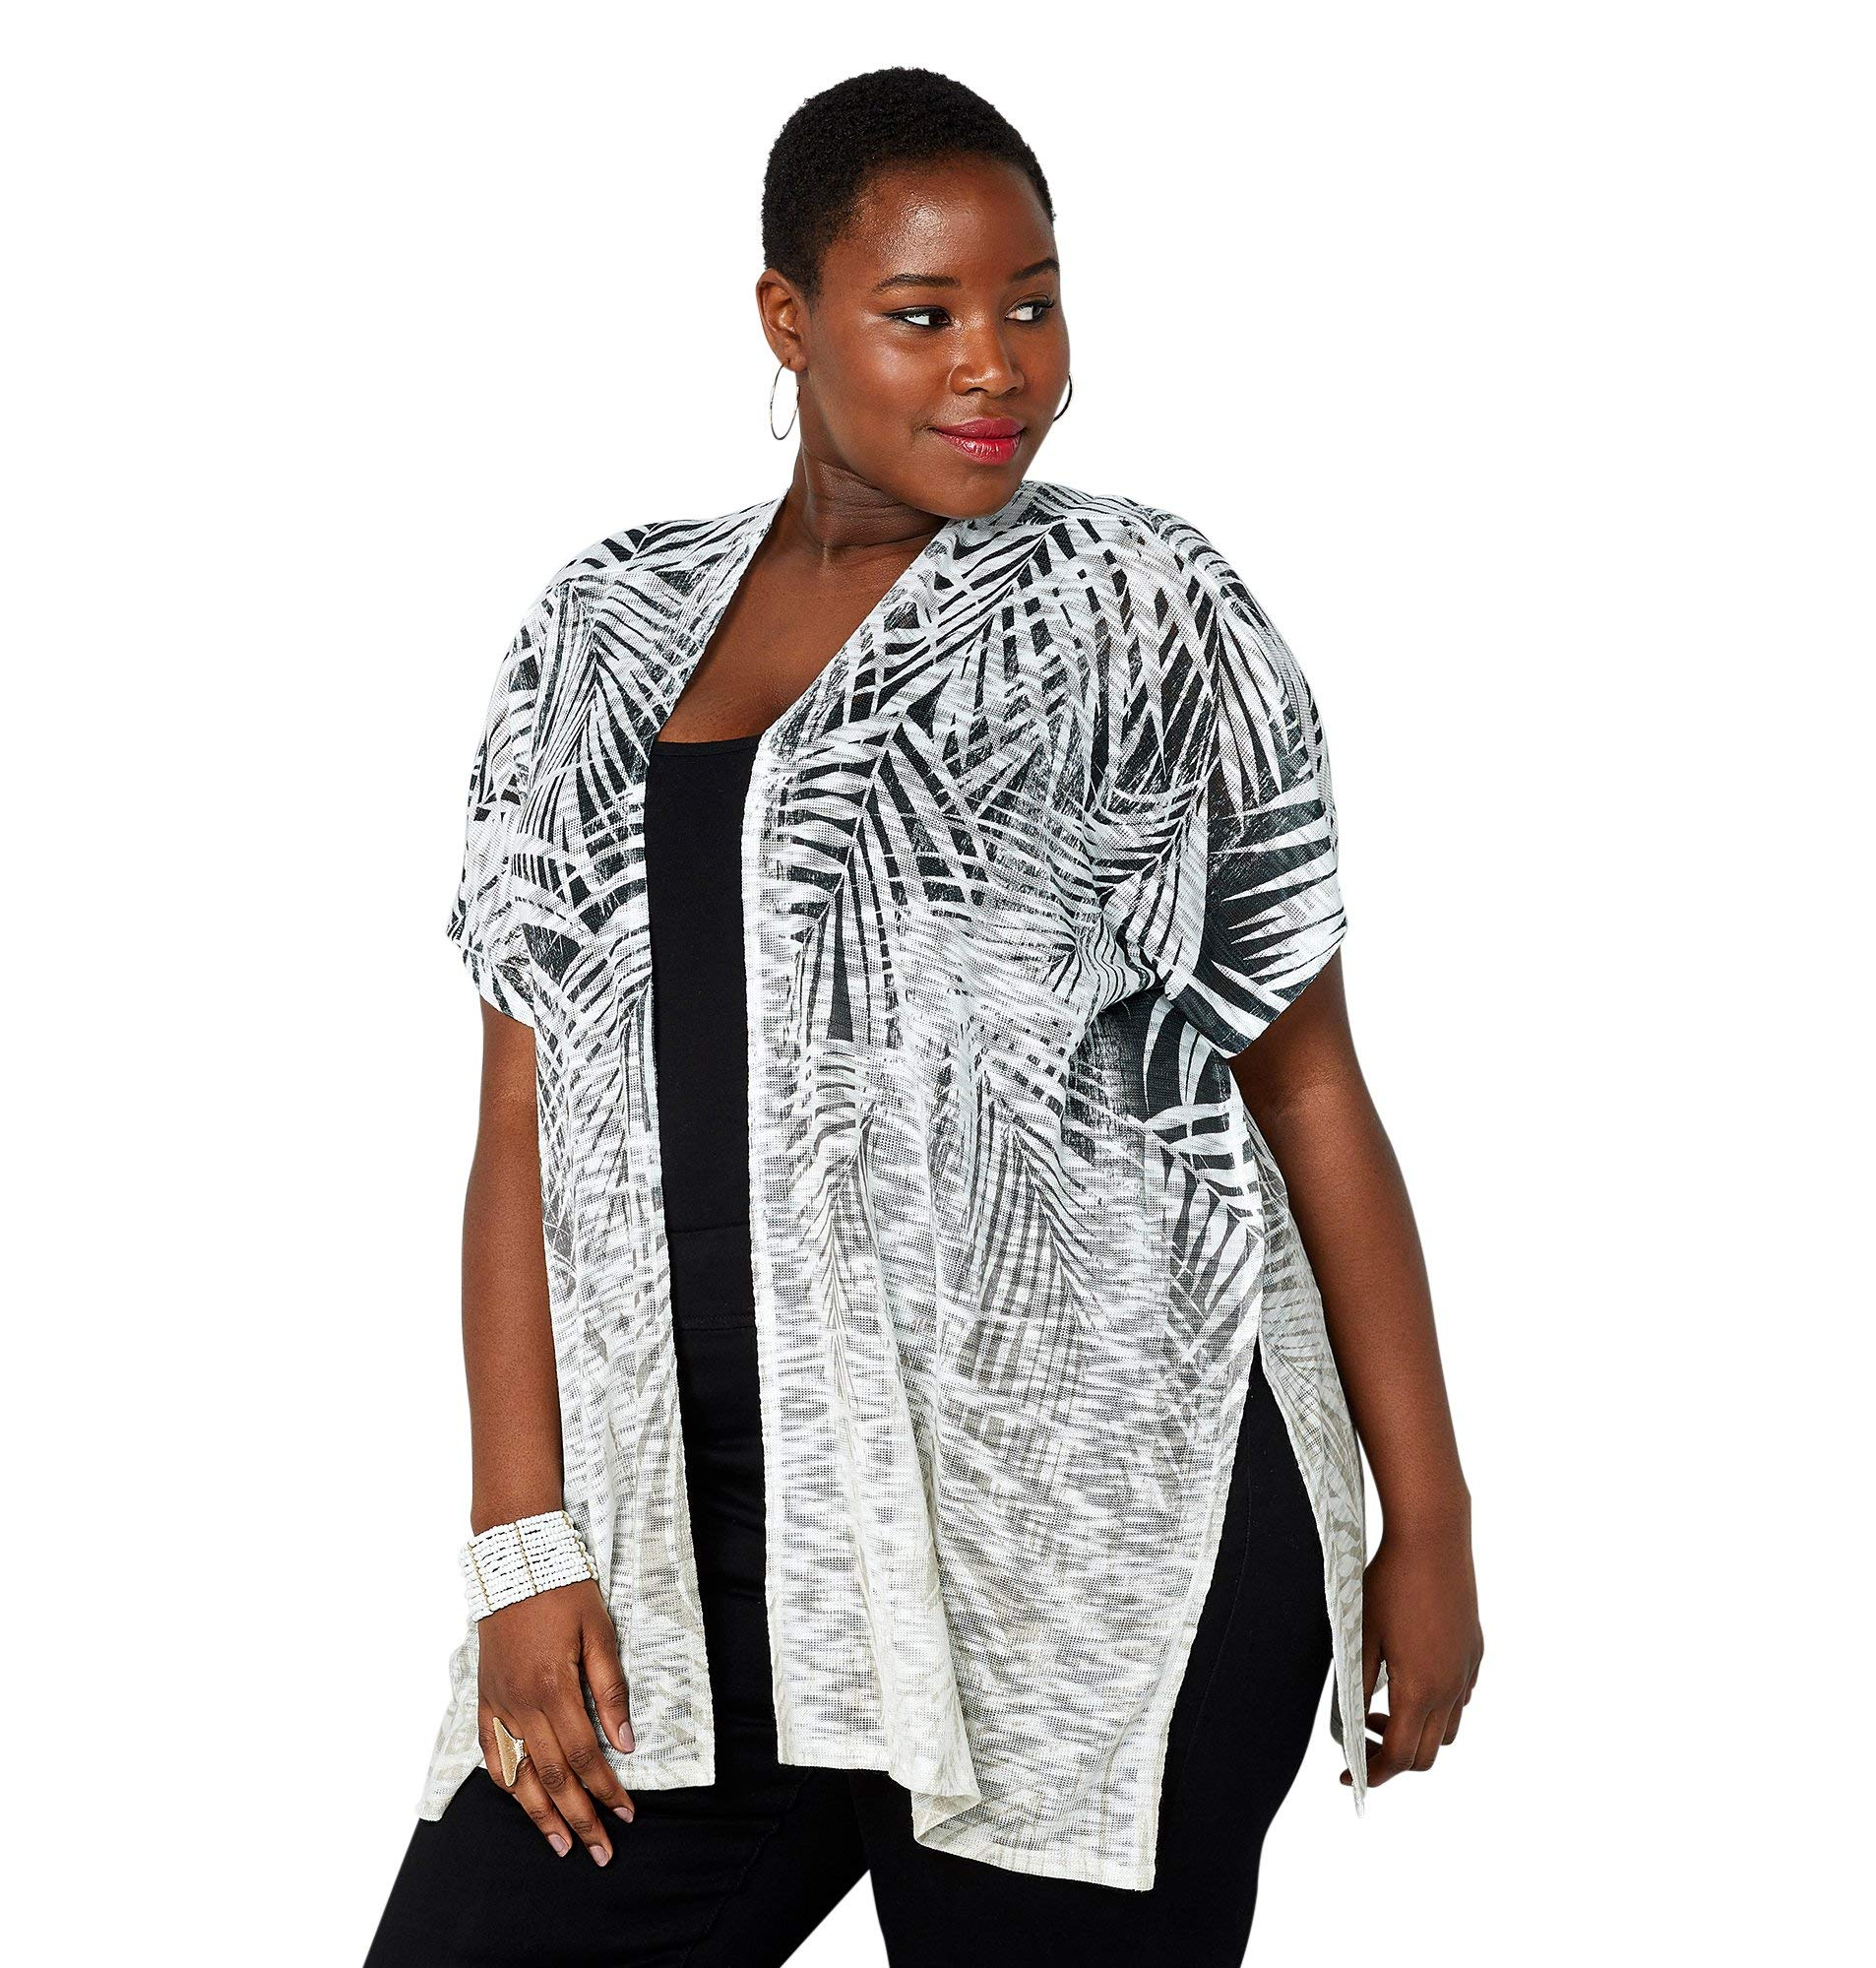 AVENUE Women's Distressed Palm Tree Print Hacci Kimono, 26/28 Off White